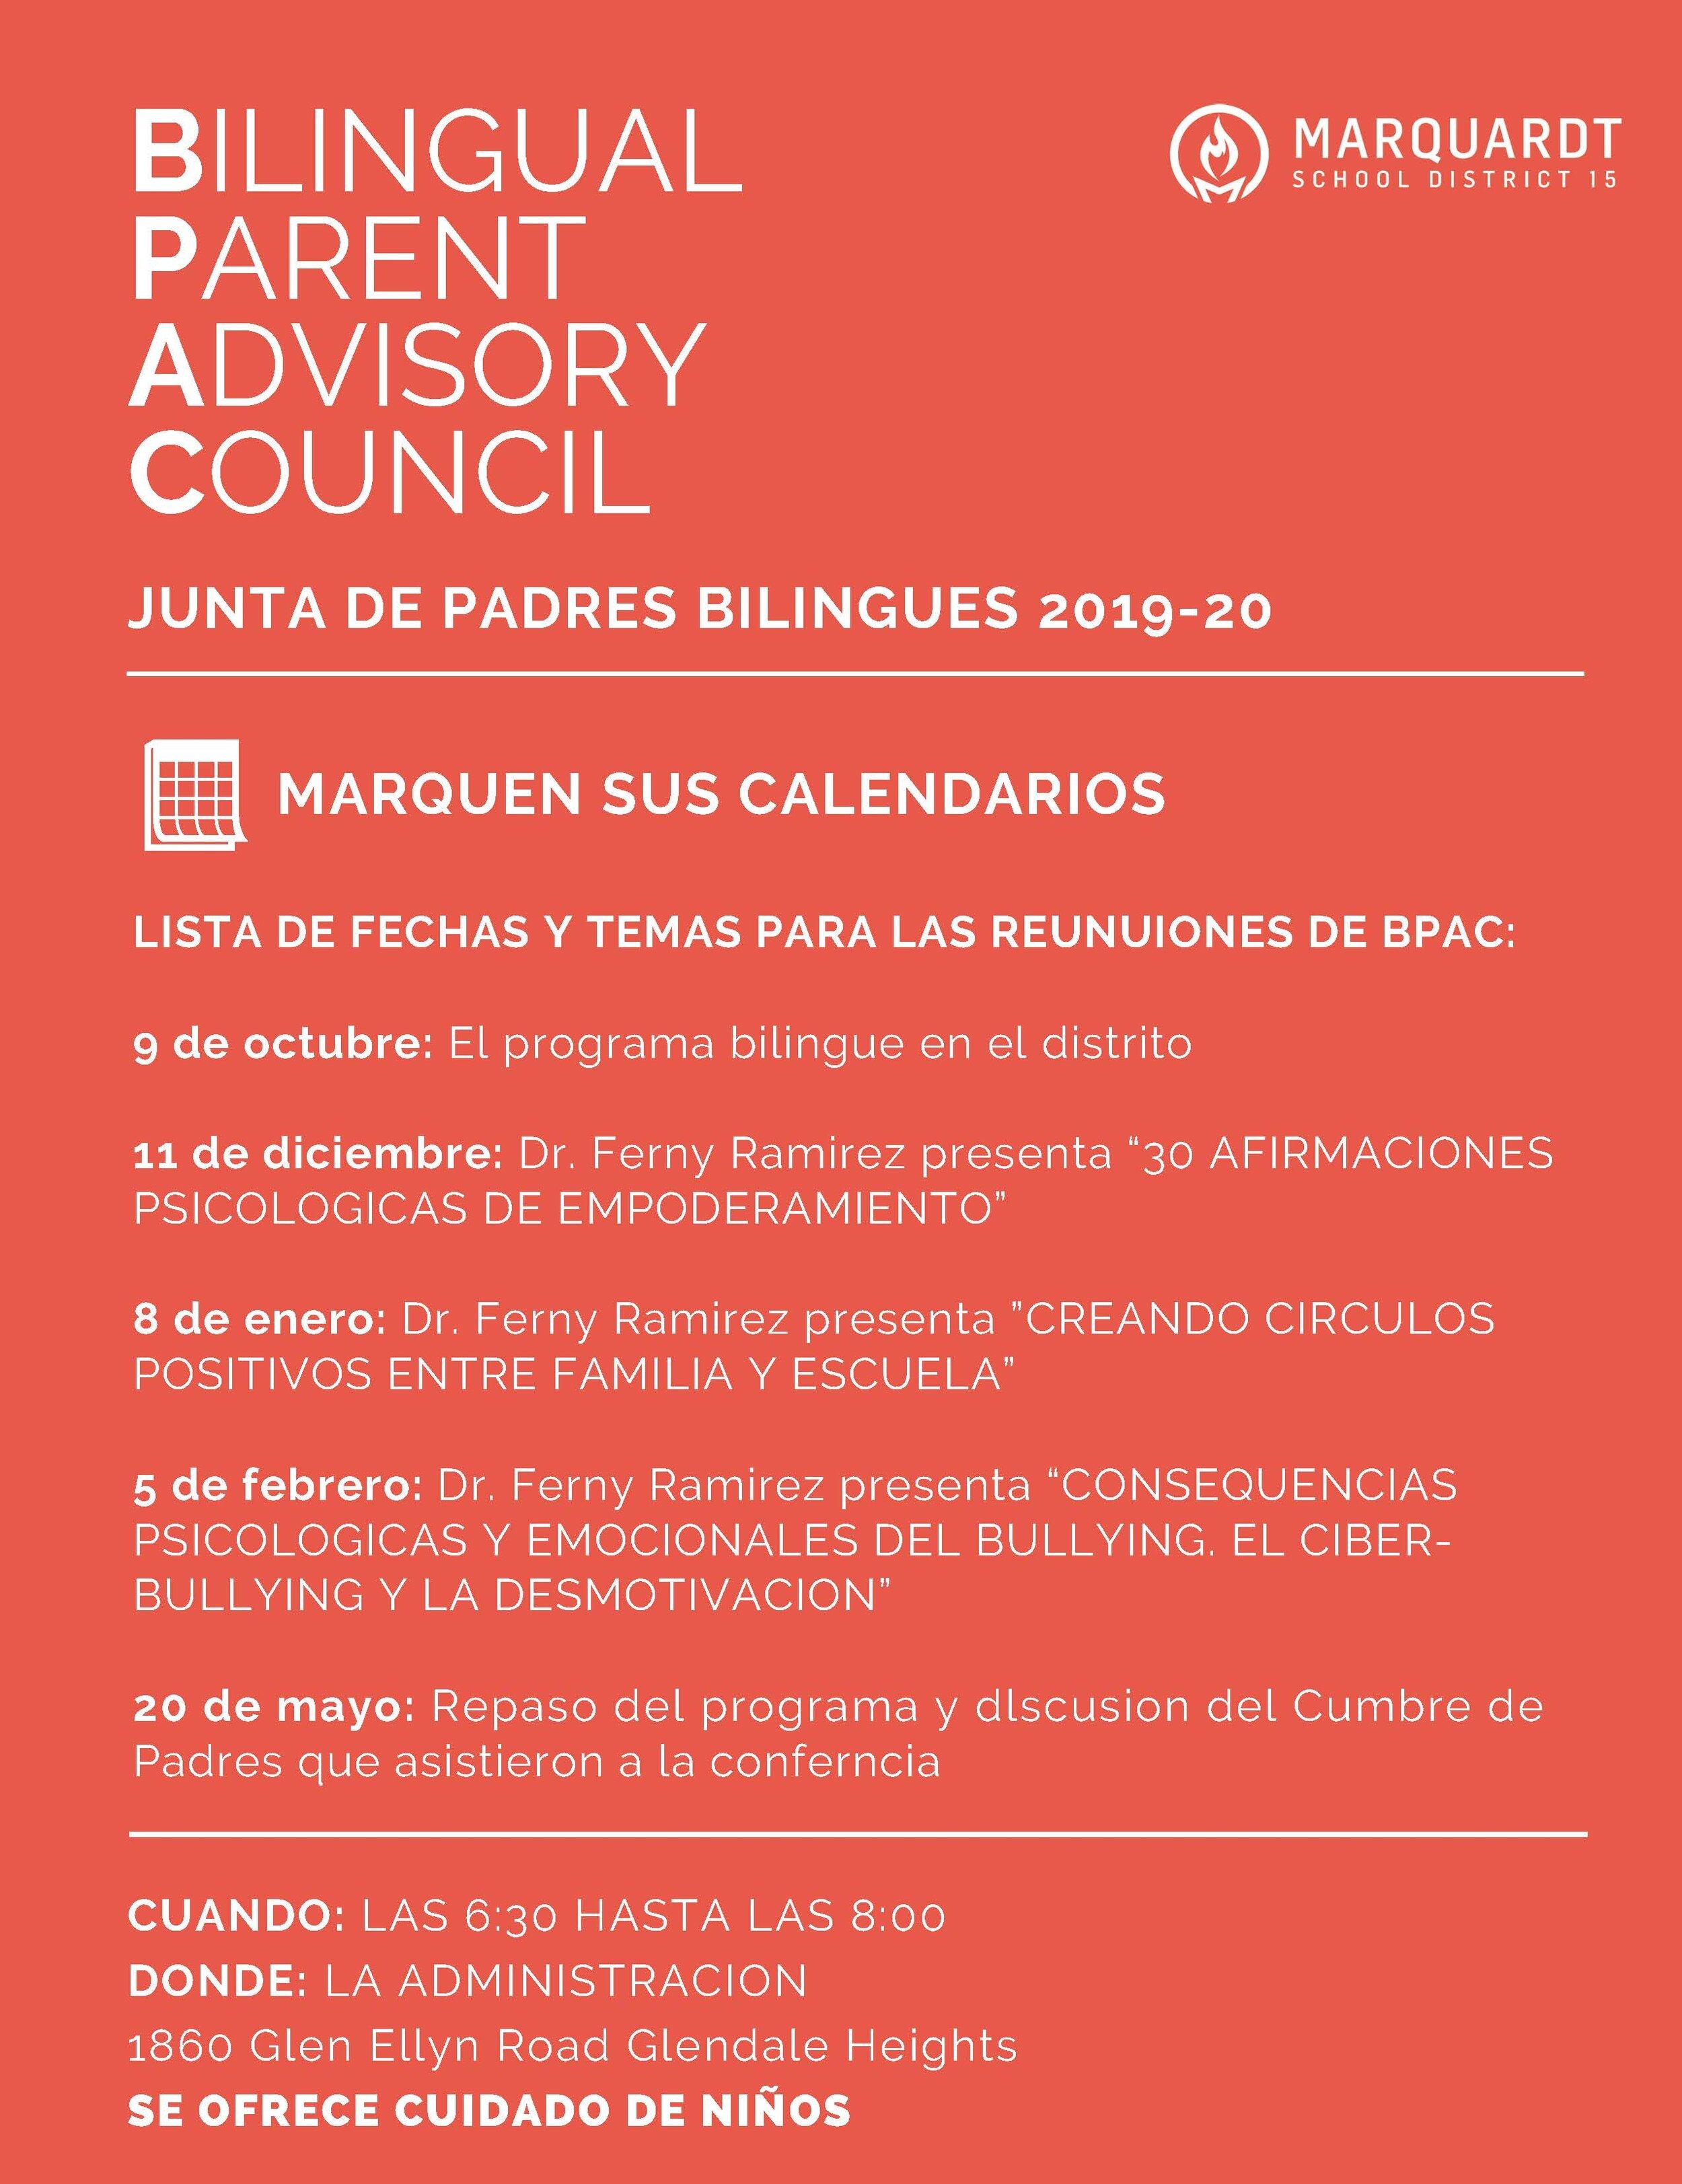 bilingual parent advisory council_1920.jpg